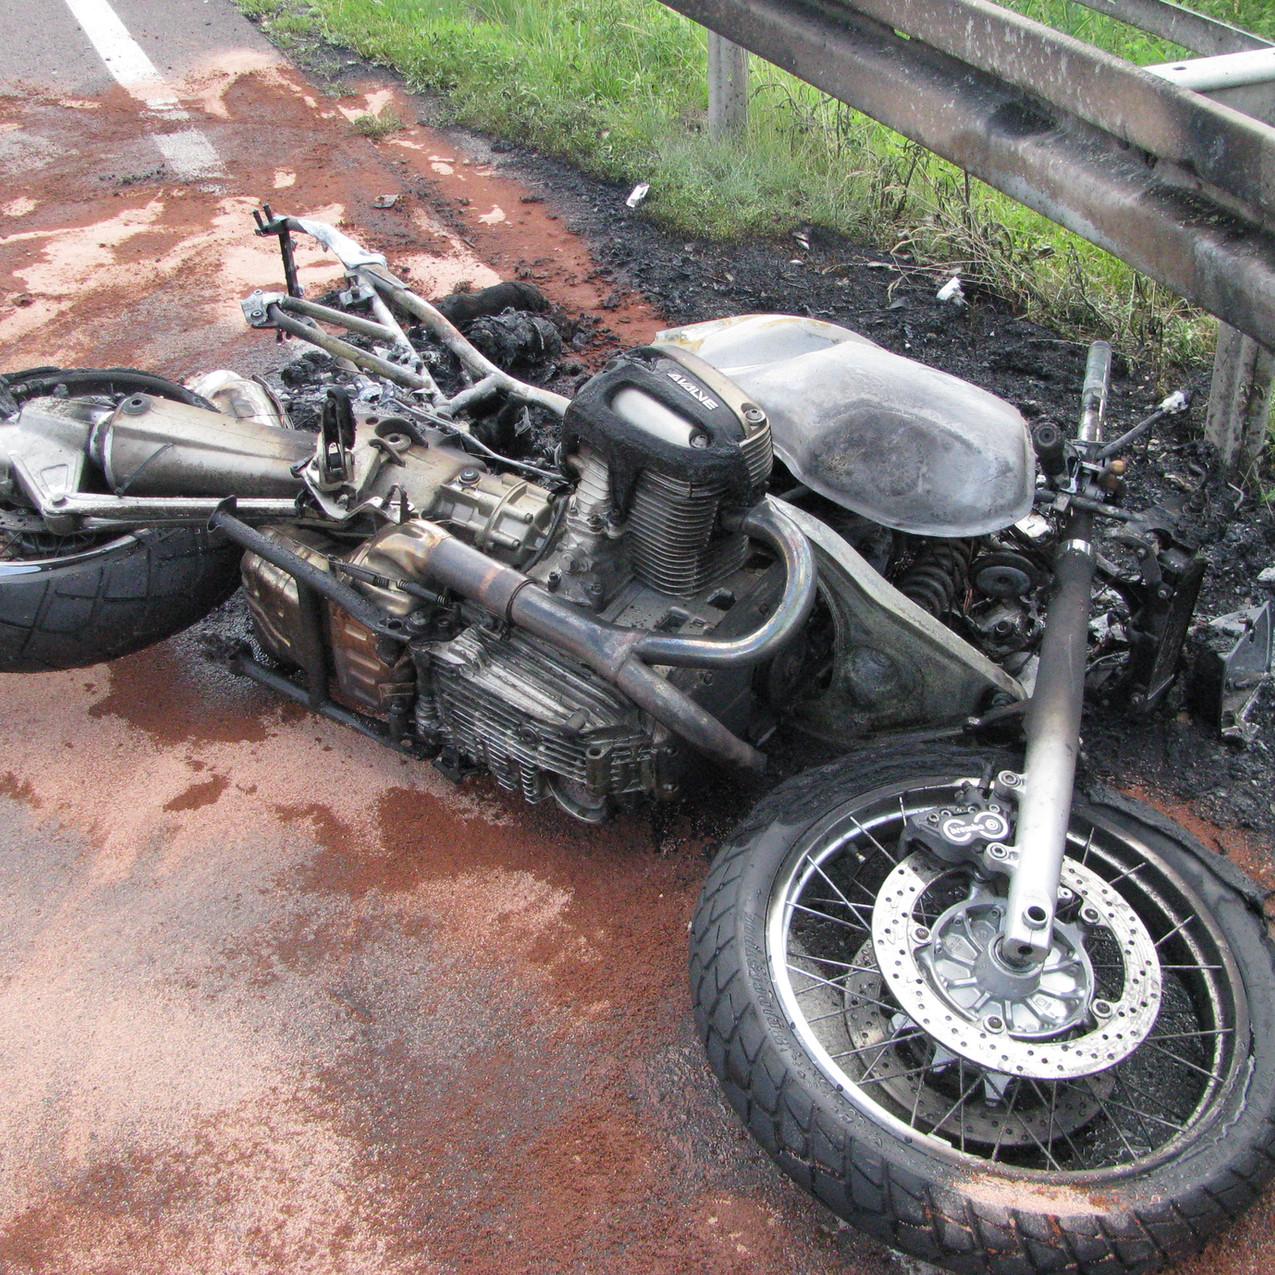 Motorradbrand nach Unfall